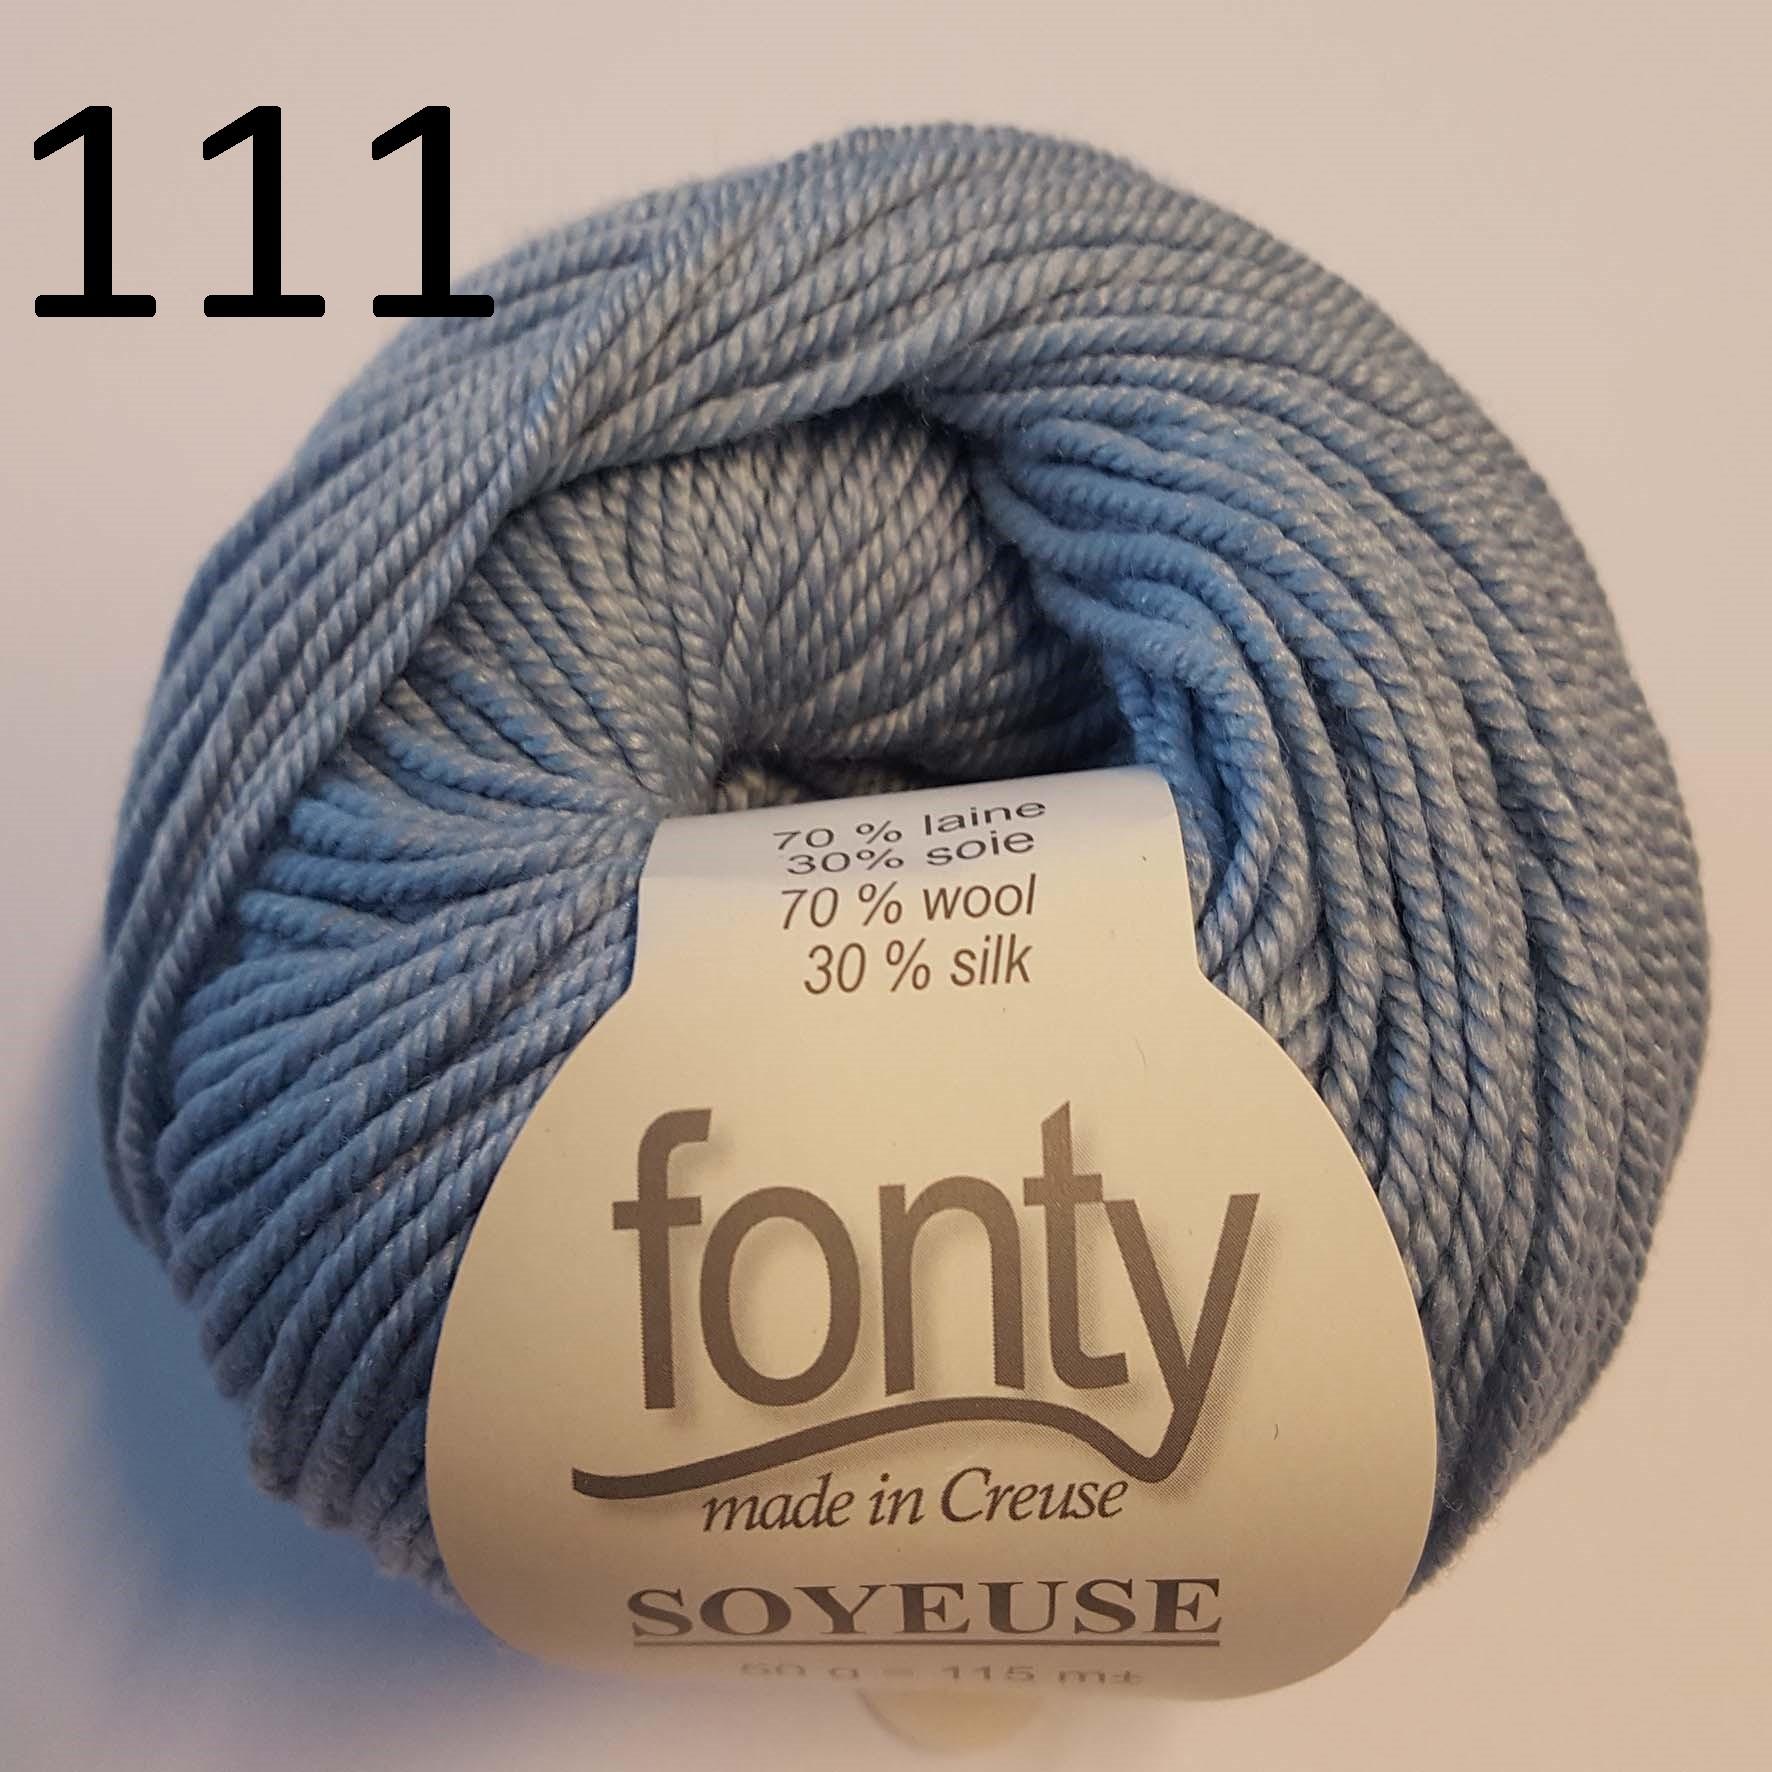 Soyeuse 111